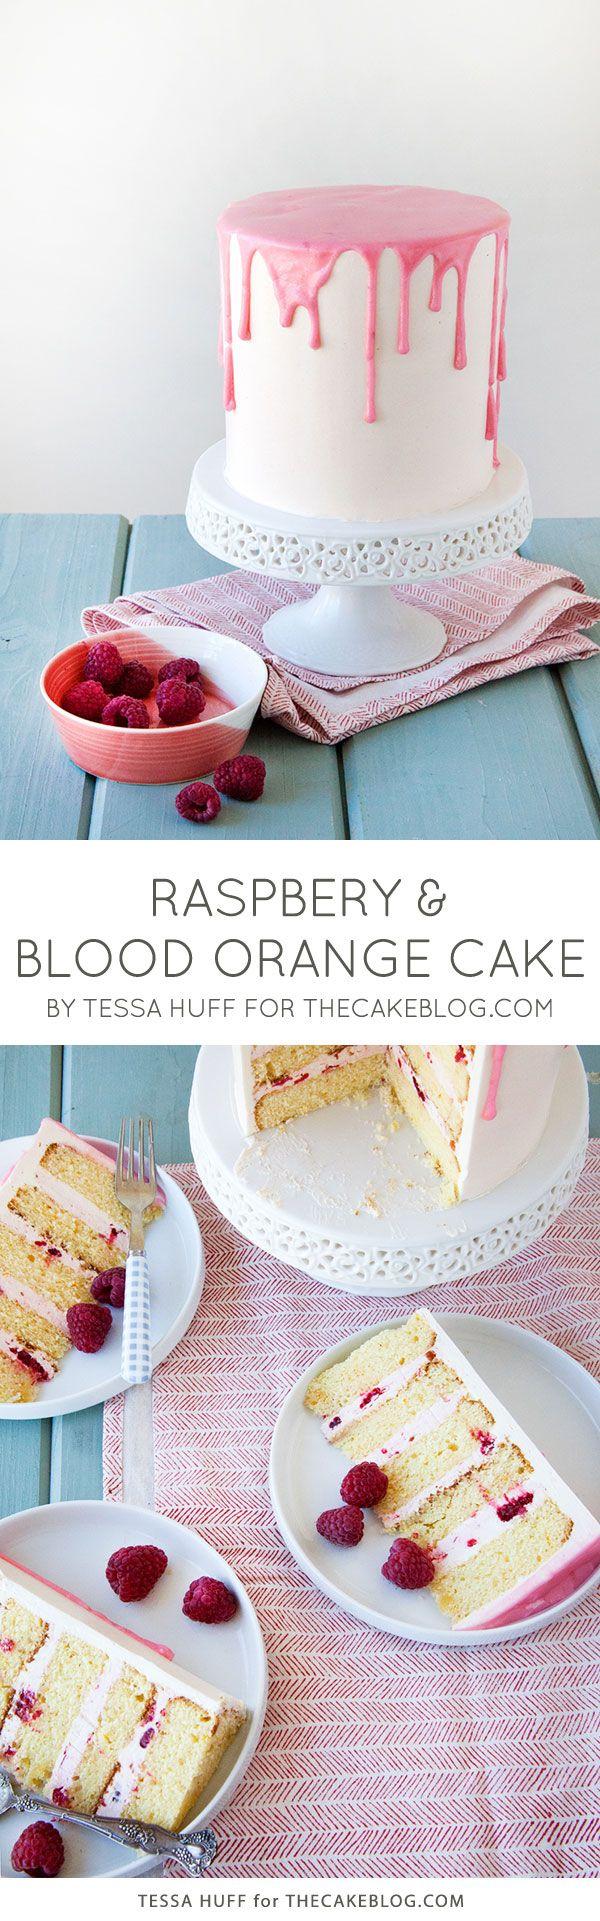 fresh raspberries and a blood orange glaze | Raspberry  Blood Orange Cake| Recipe by Tessa Huff for TheCakeBlog.com